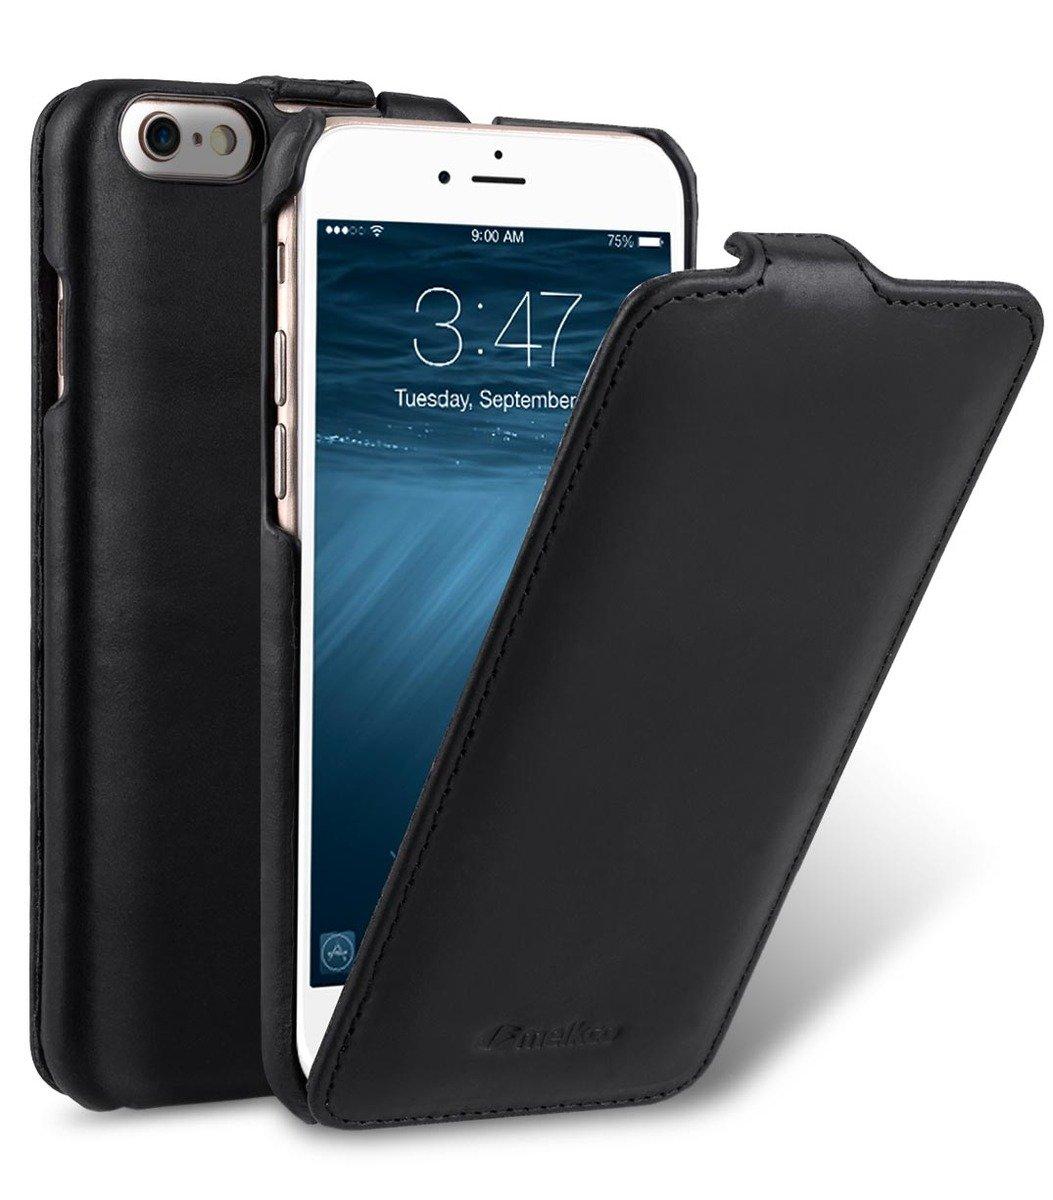 Apple iPhone 6s/6 Jacka Type高級真皮手機套-瘋馬黑色